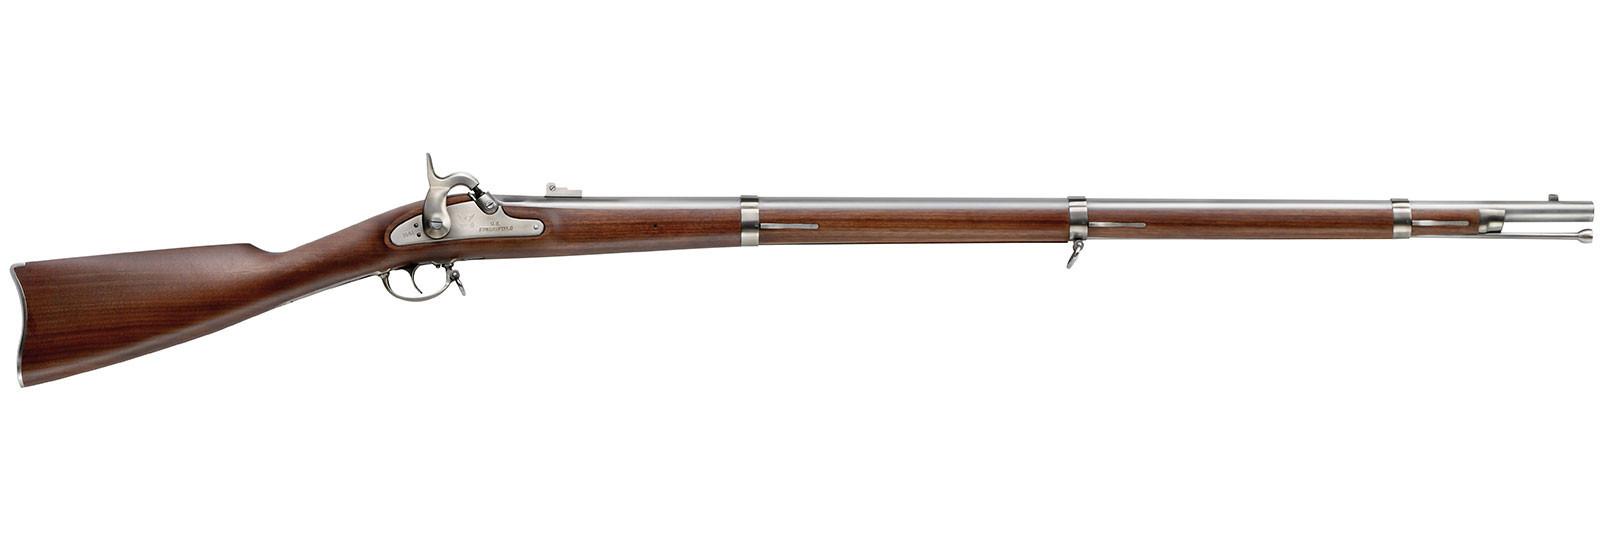 Fucile Springfield mod.1861 US